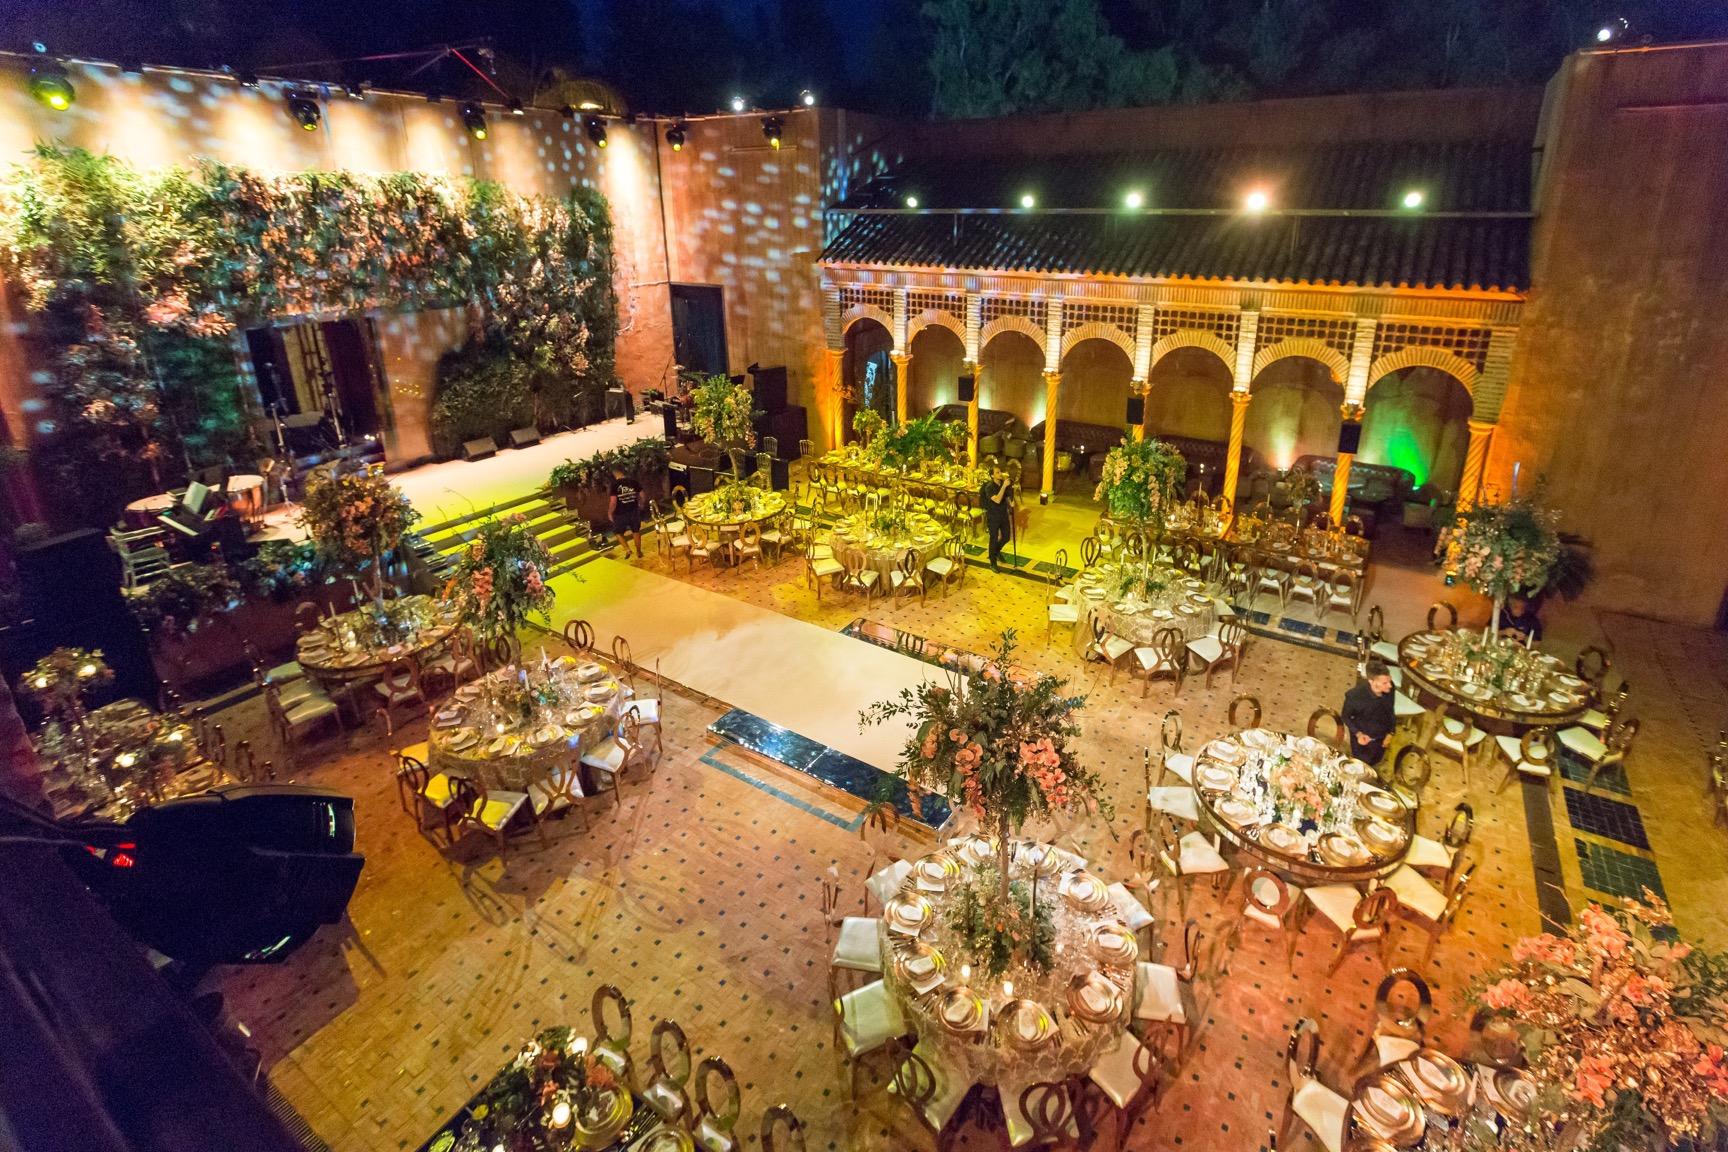 Si-Quiero-Wedding-Planner-By-Sira-Antequera-Bodas-Málaga-Marbella-Miami- L-A-56